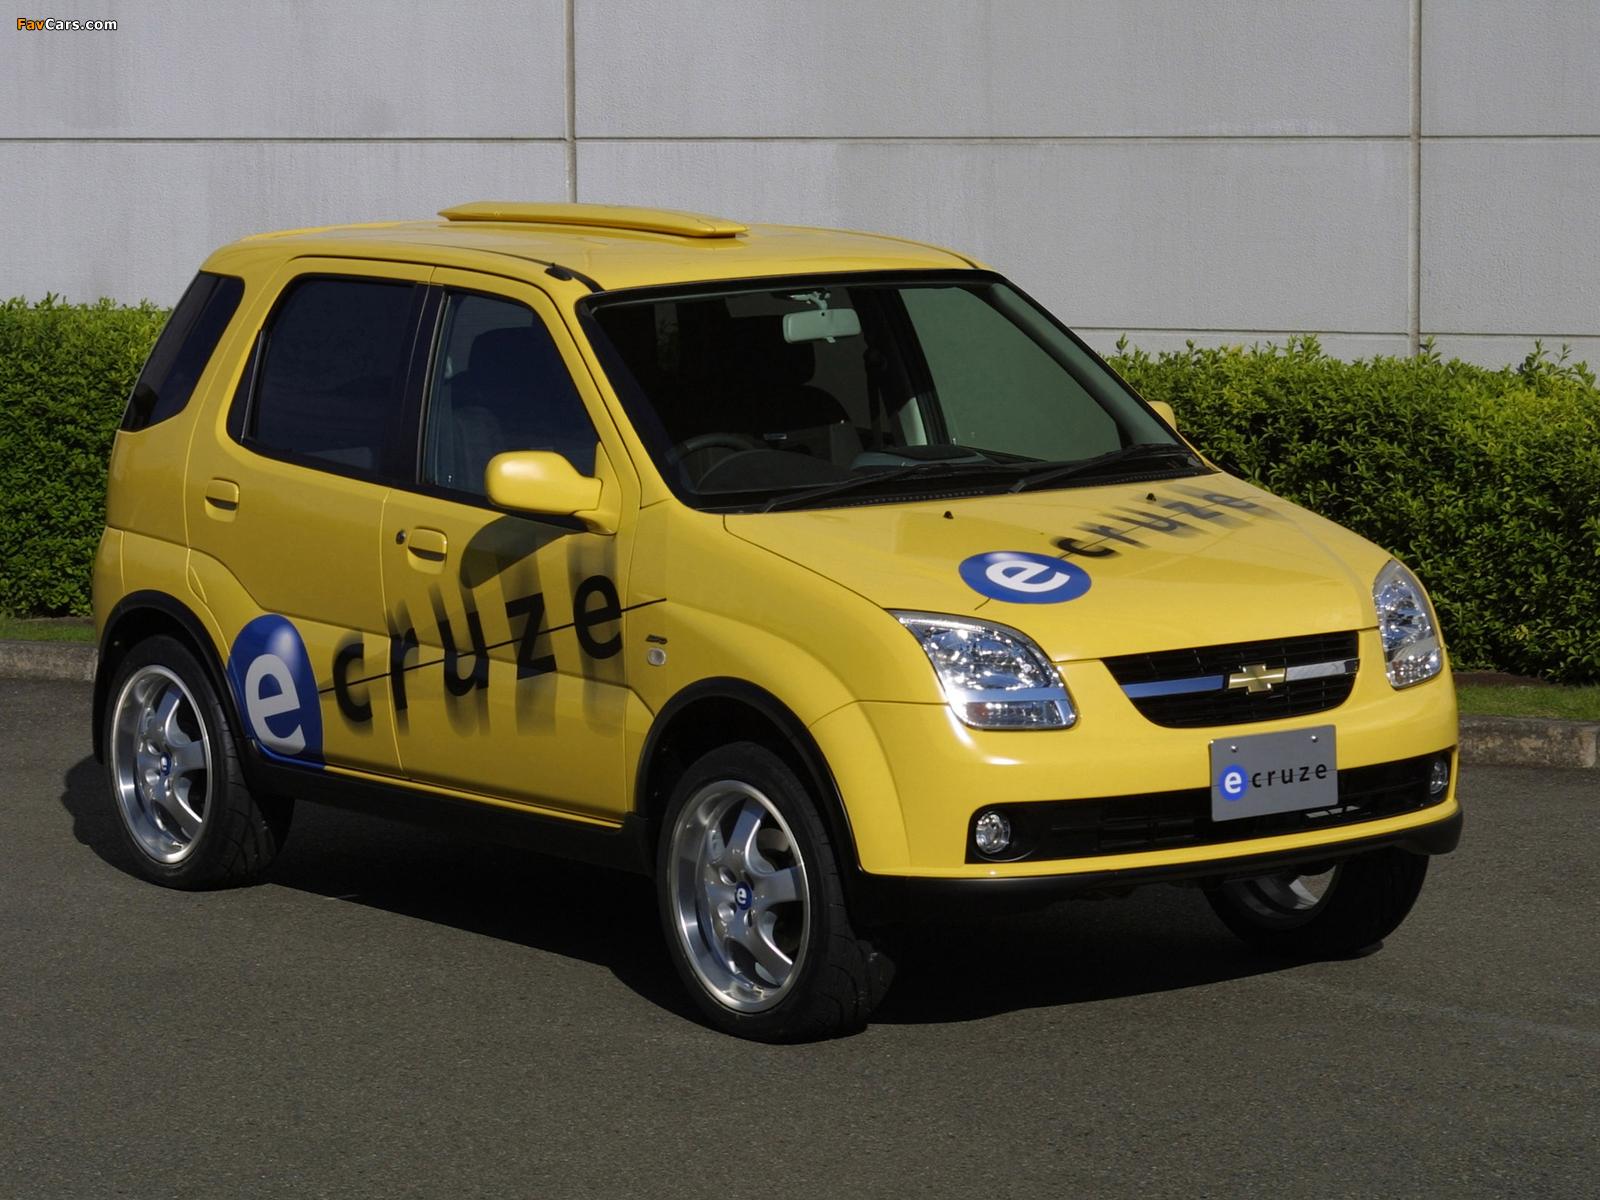 Chevrolet e-Cruze Concept 2001 pictures (1600 x 1200)